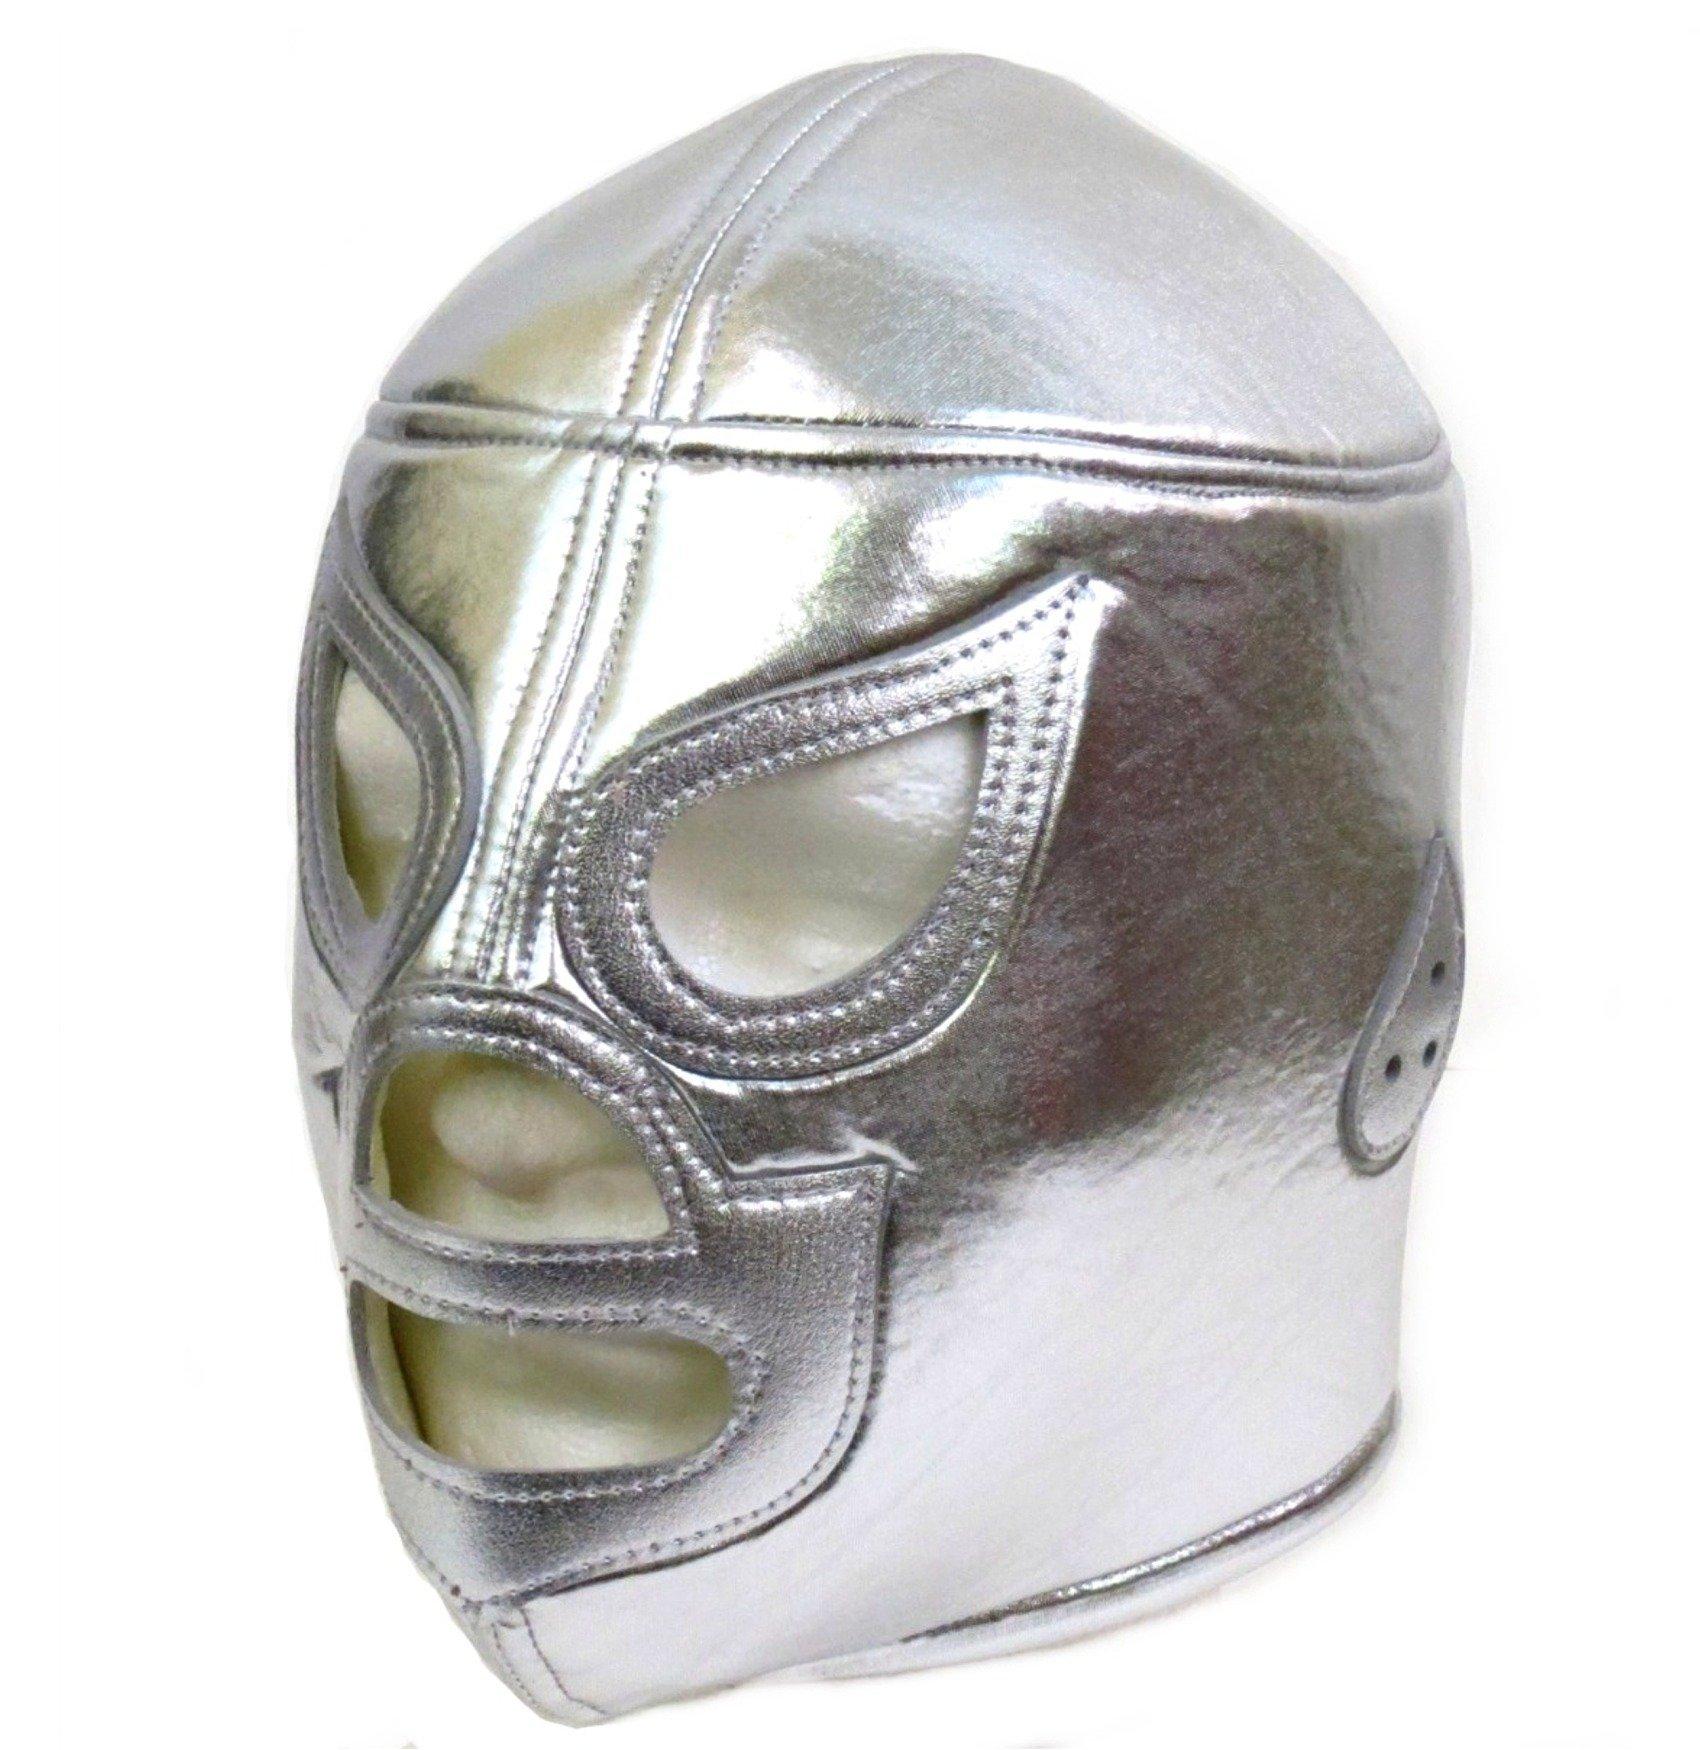 EL SANTO Adult Lucha Libre Wrestling Mask (pro-fit) Costume Wear - Silver